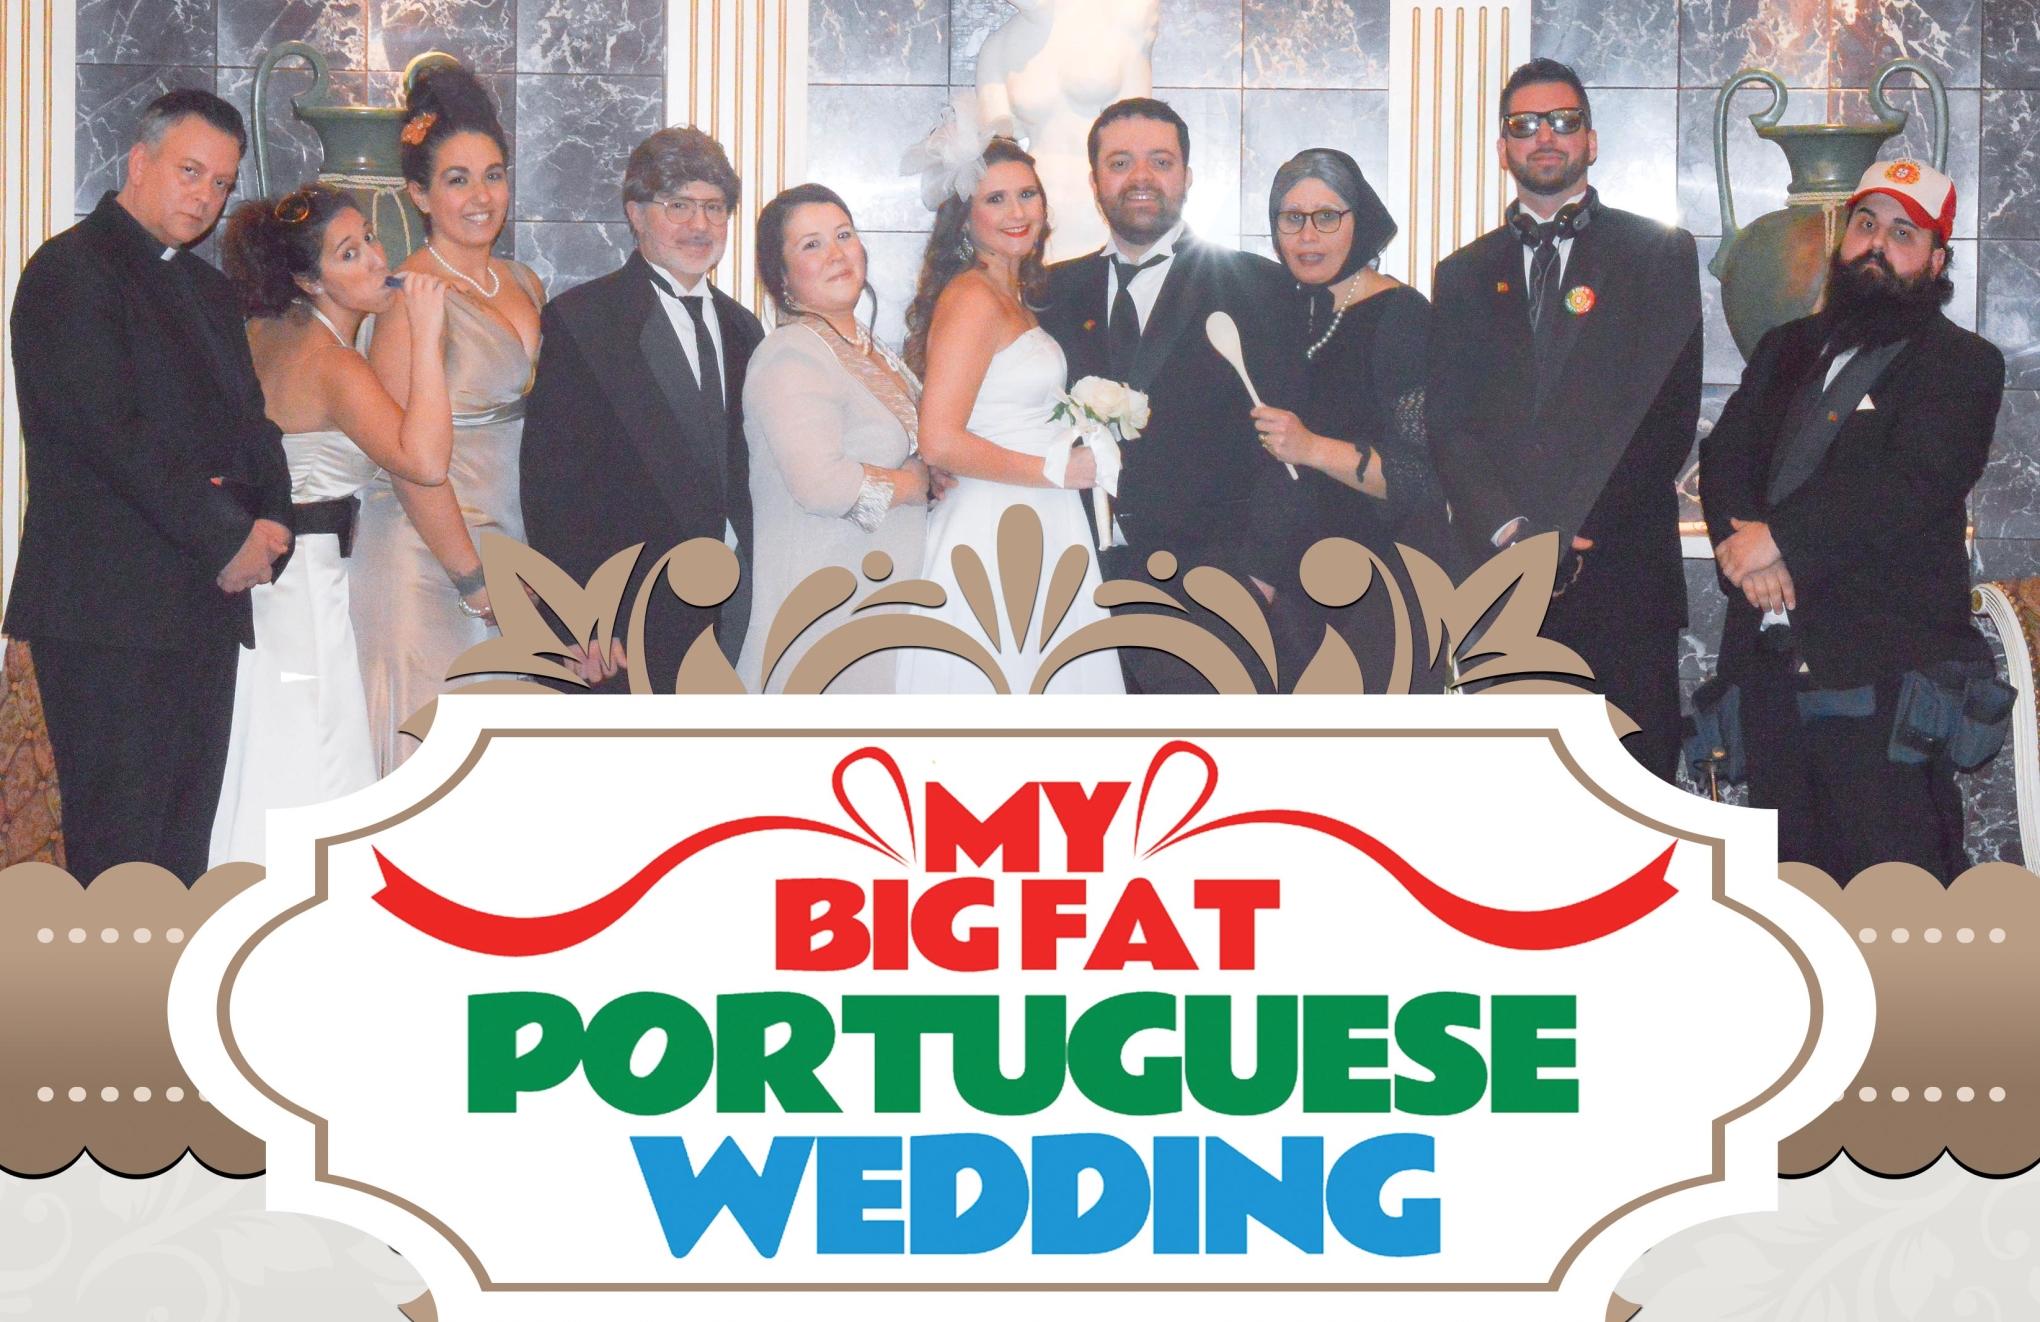 My Big Fat Portuguese Wedding at Saint Anthony's Parish Hall on Friday, May 12, 2017